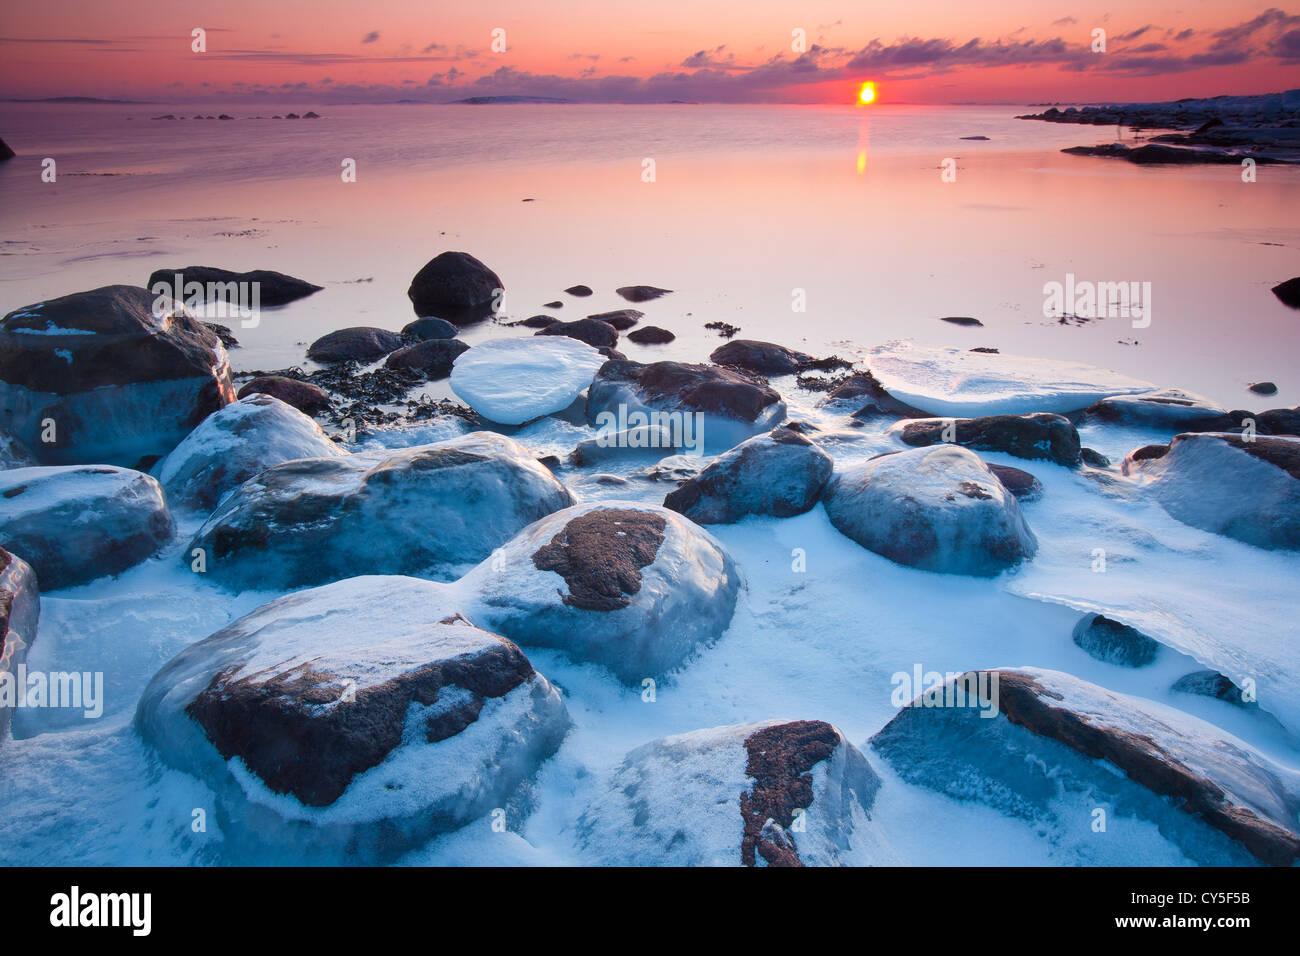 Coastal winter landscape at sunset, at Larkollen in Rygge kommune, Østfold fylke, Norway. Stock Photo